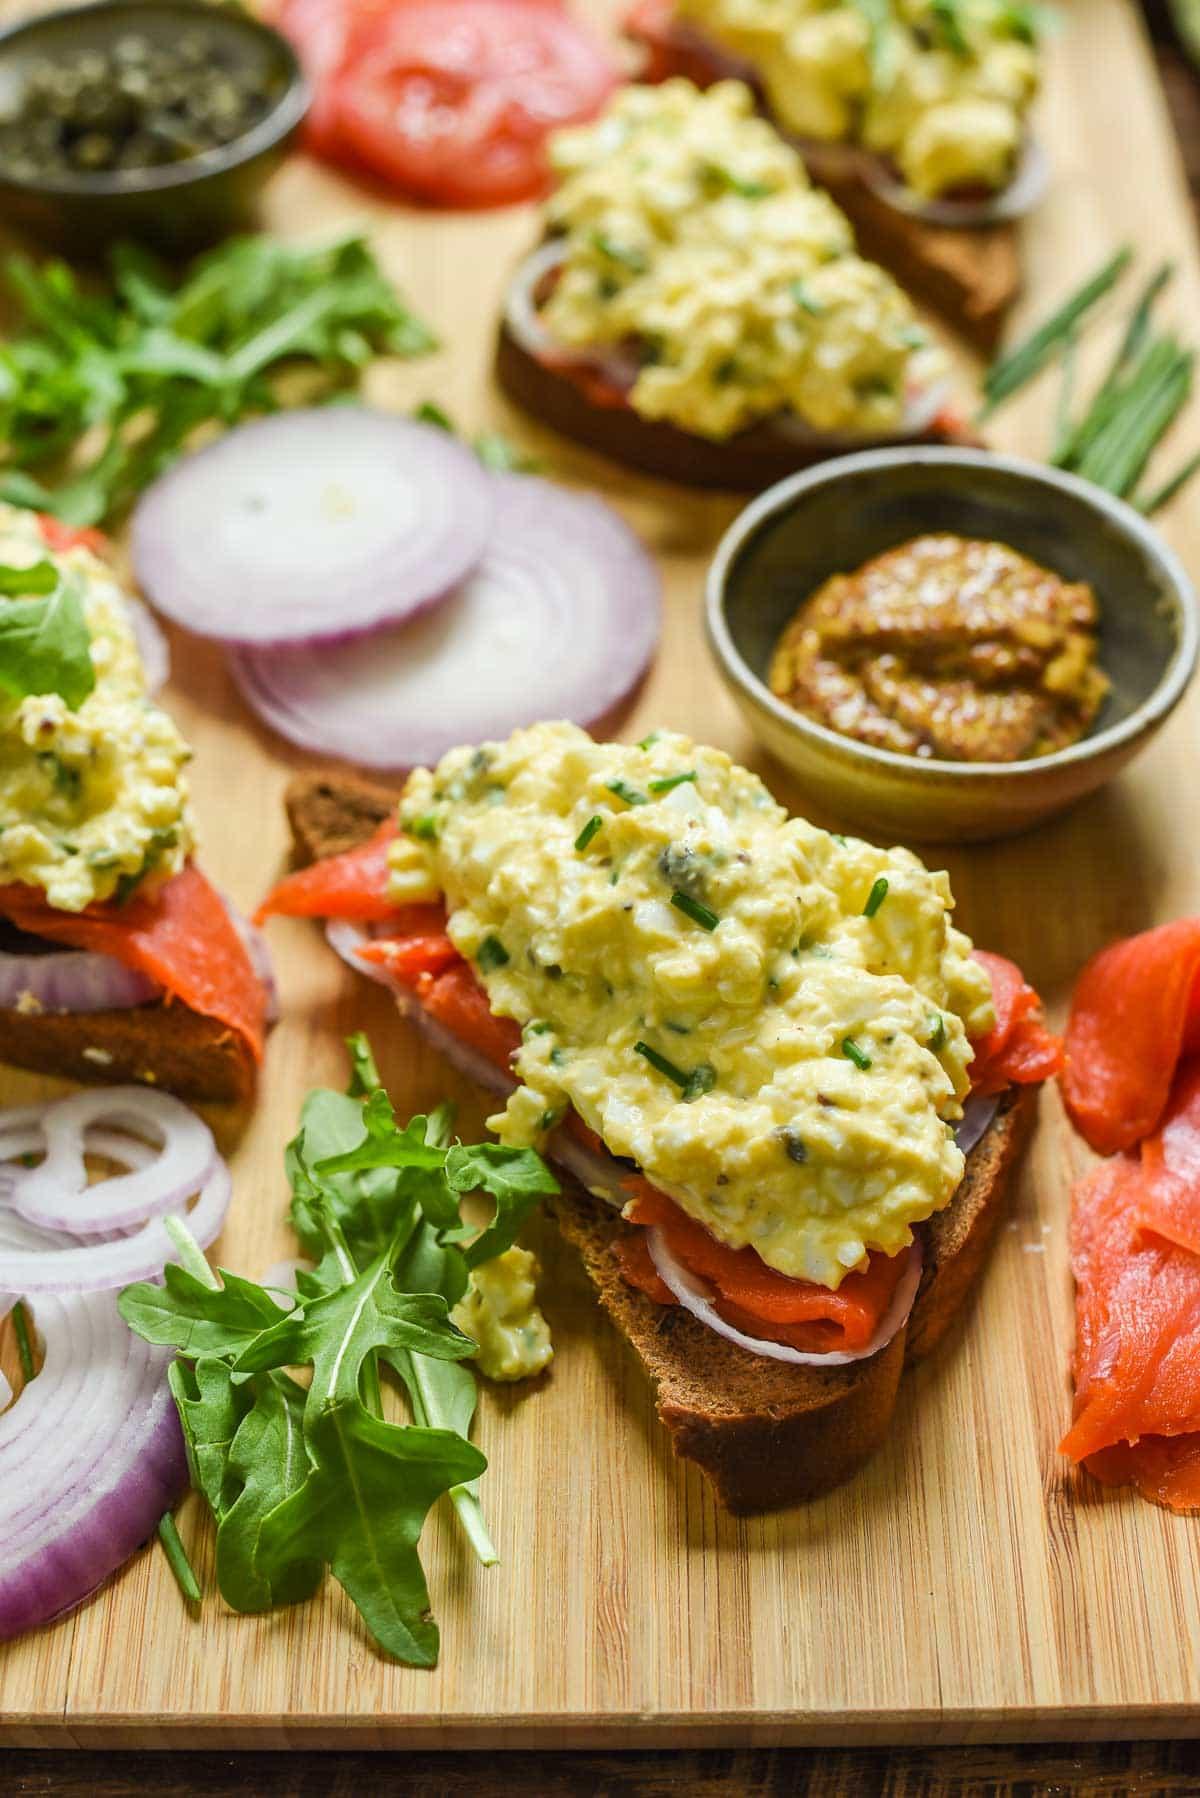 Smoked Salmon Egg Salad Sandwiches